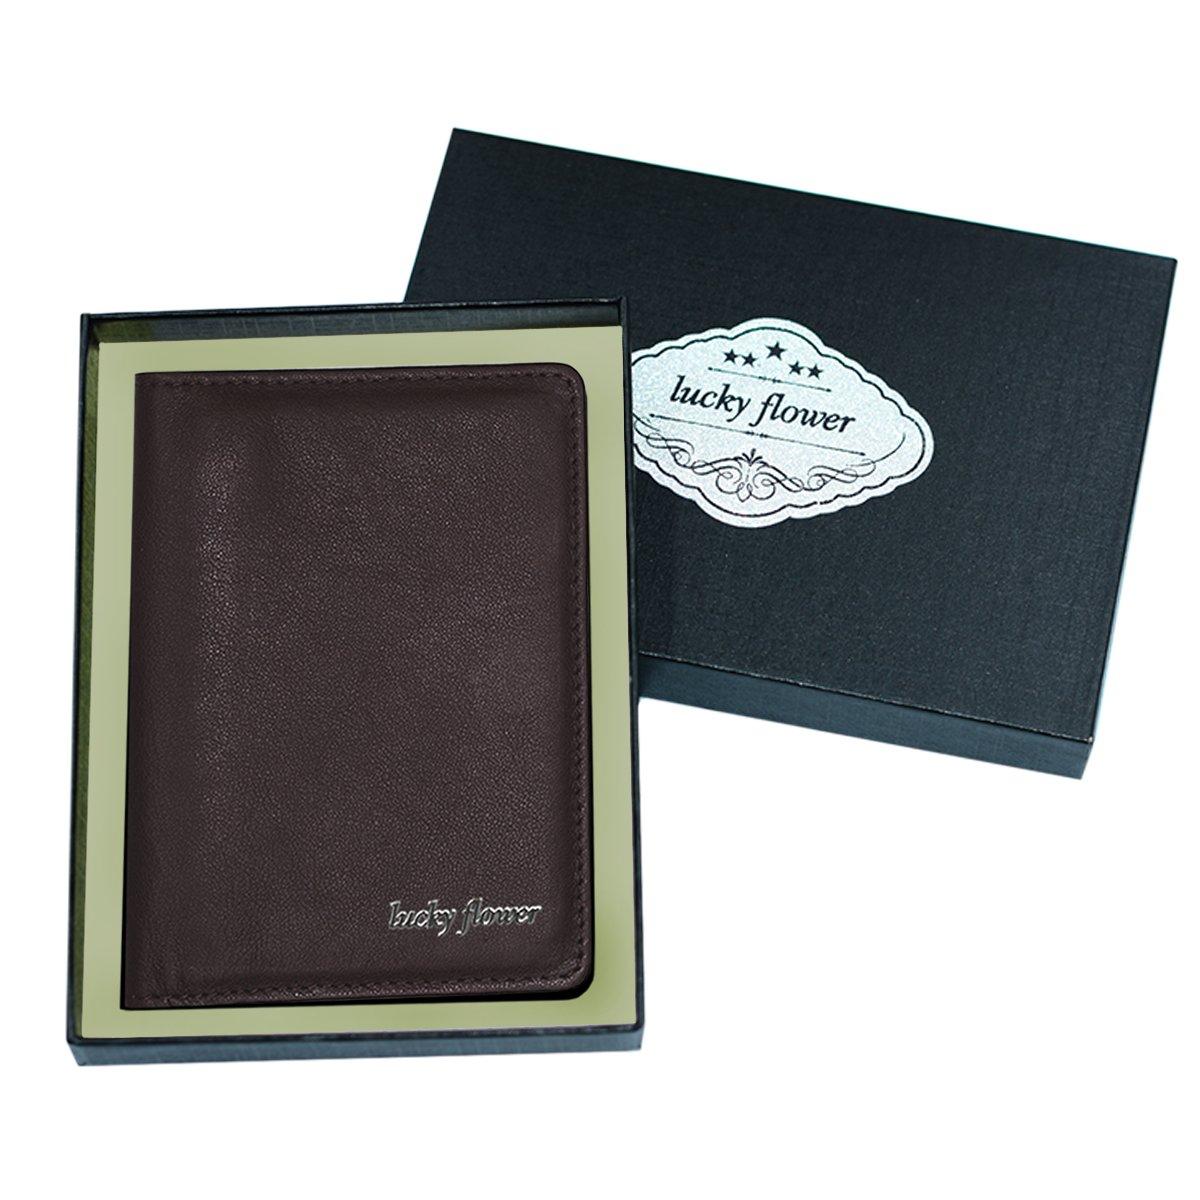 LUCKY FLOWER RFID Blocking Travel Wallet for Men,Minimalist Genuine Leather Slim Bifold Card Holder Purse(Coffee) by LUCKY FLOWER (Image #7)